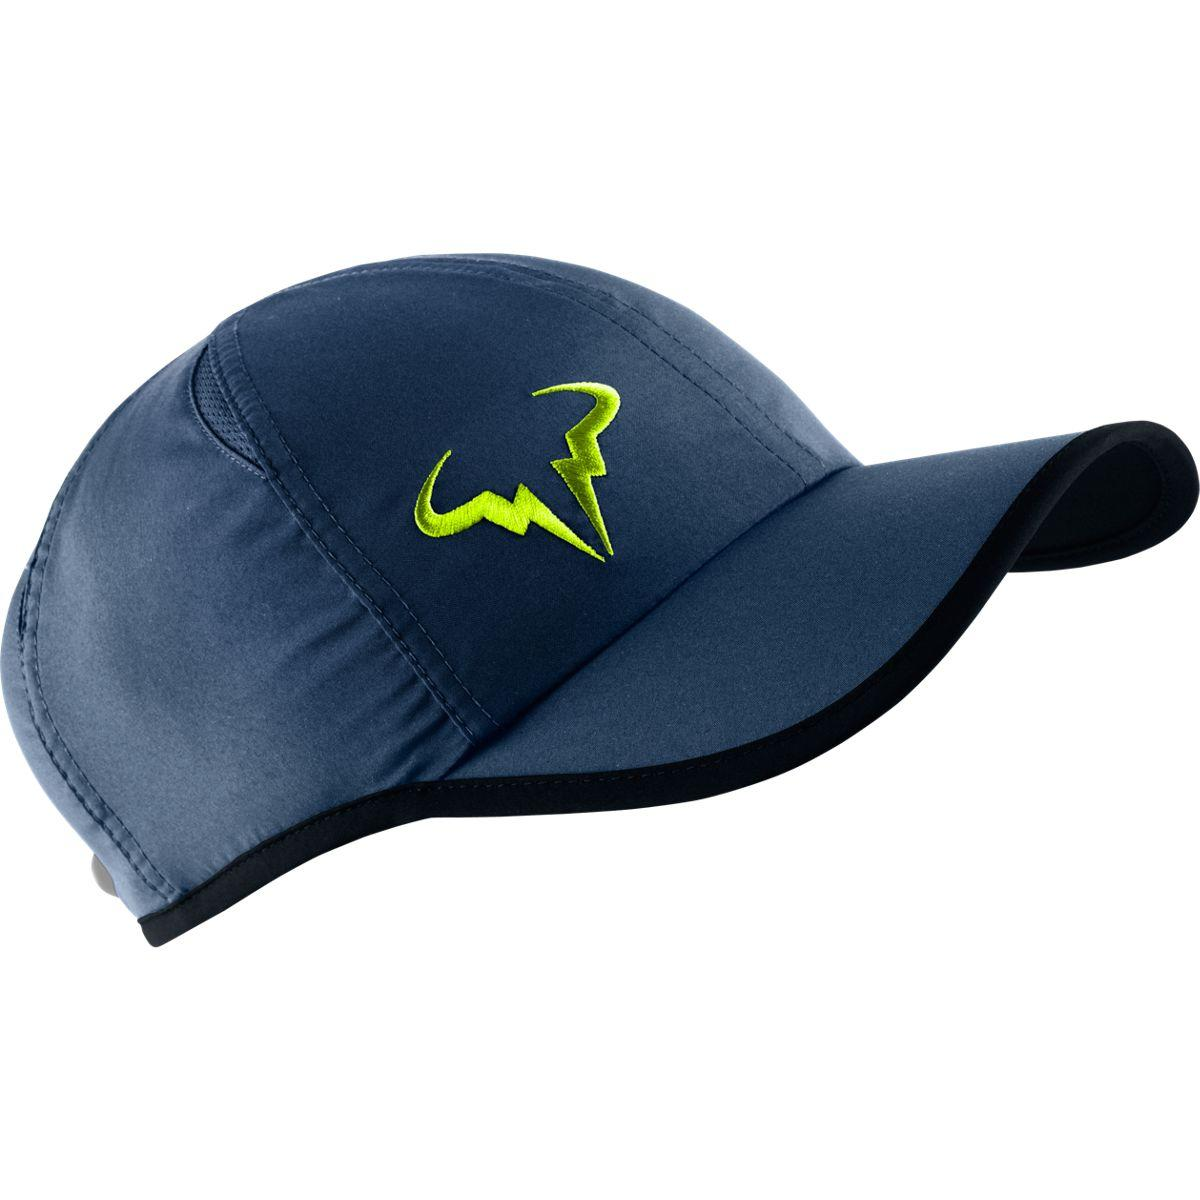 Nike Rafa Bull Logo Cap - Navy Lime - Tennisnuts.com e9c75108806